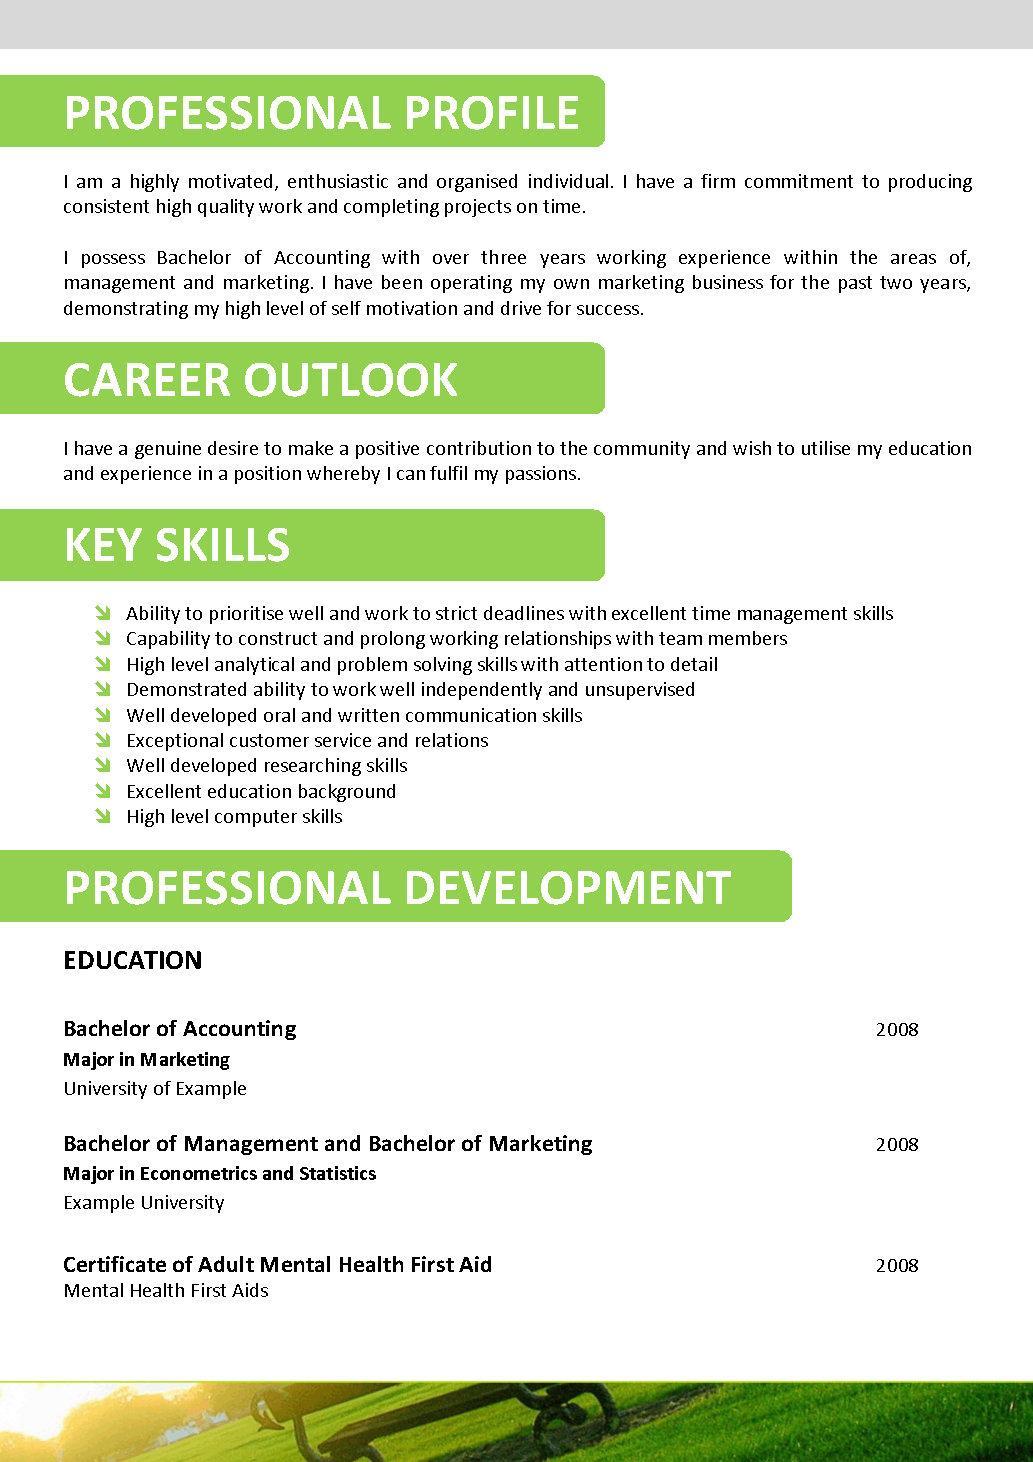 resume writing with resume templates - Resume Writing Templates